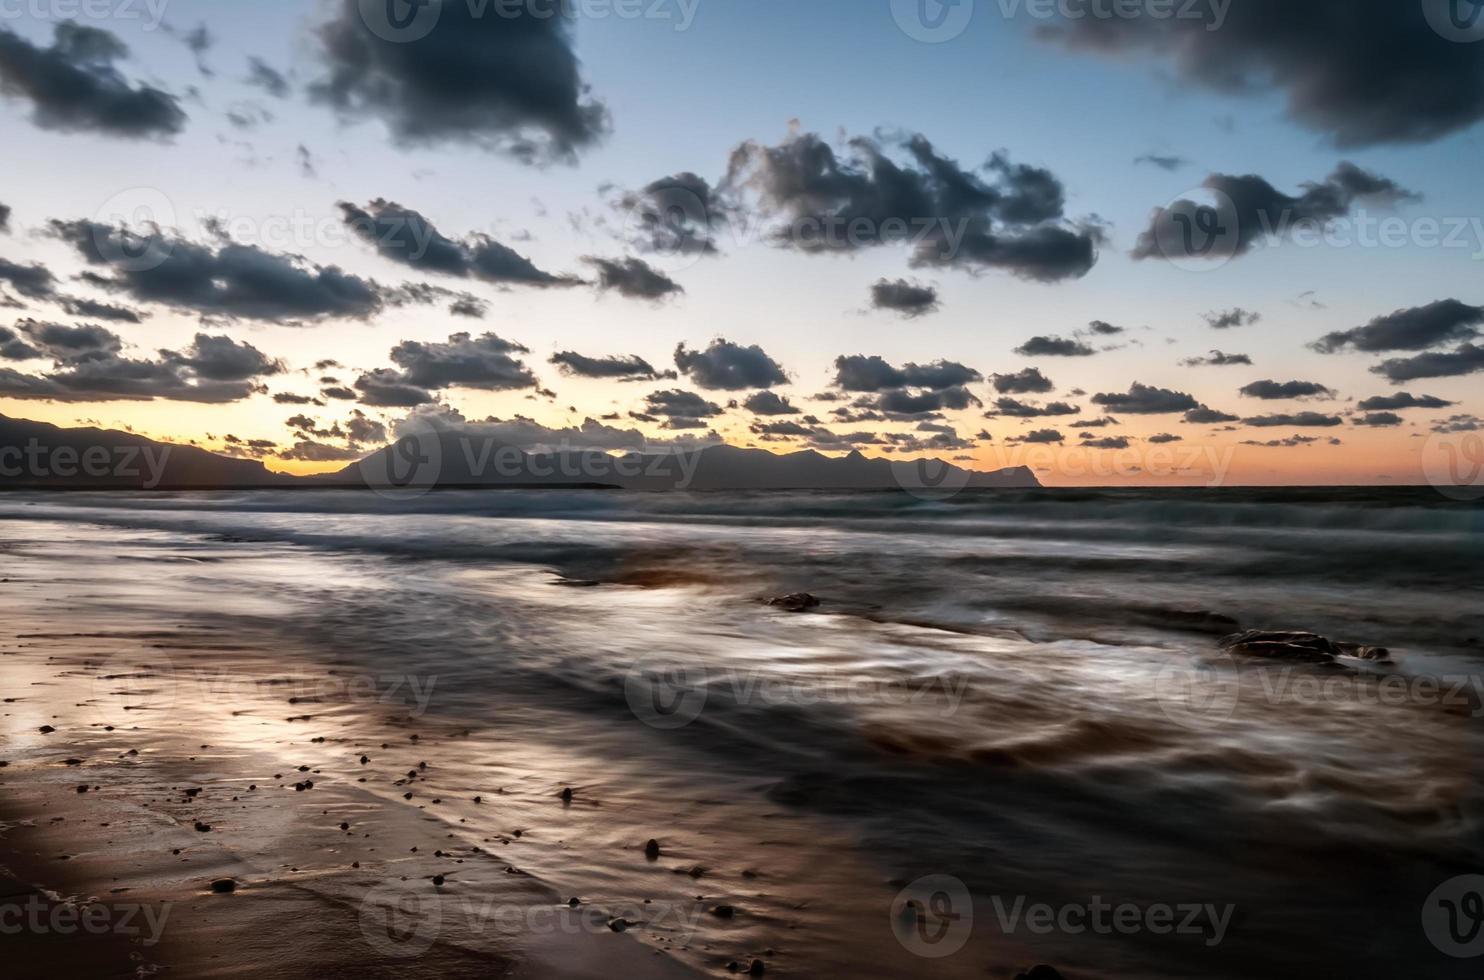 The Sicilian beach at sunset photo